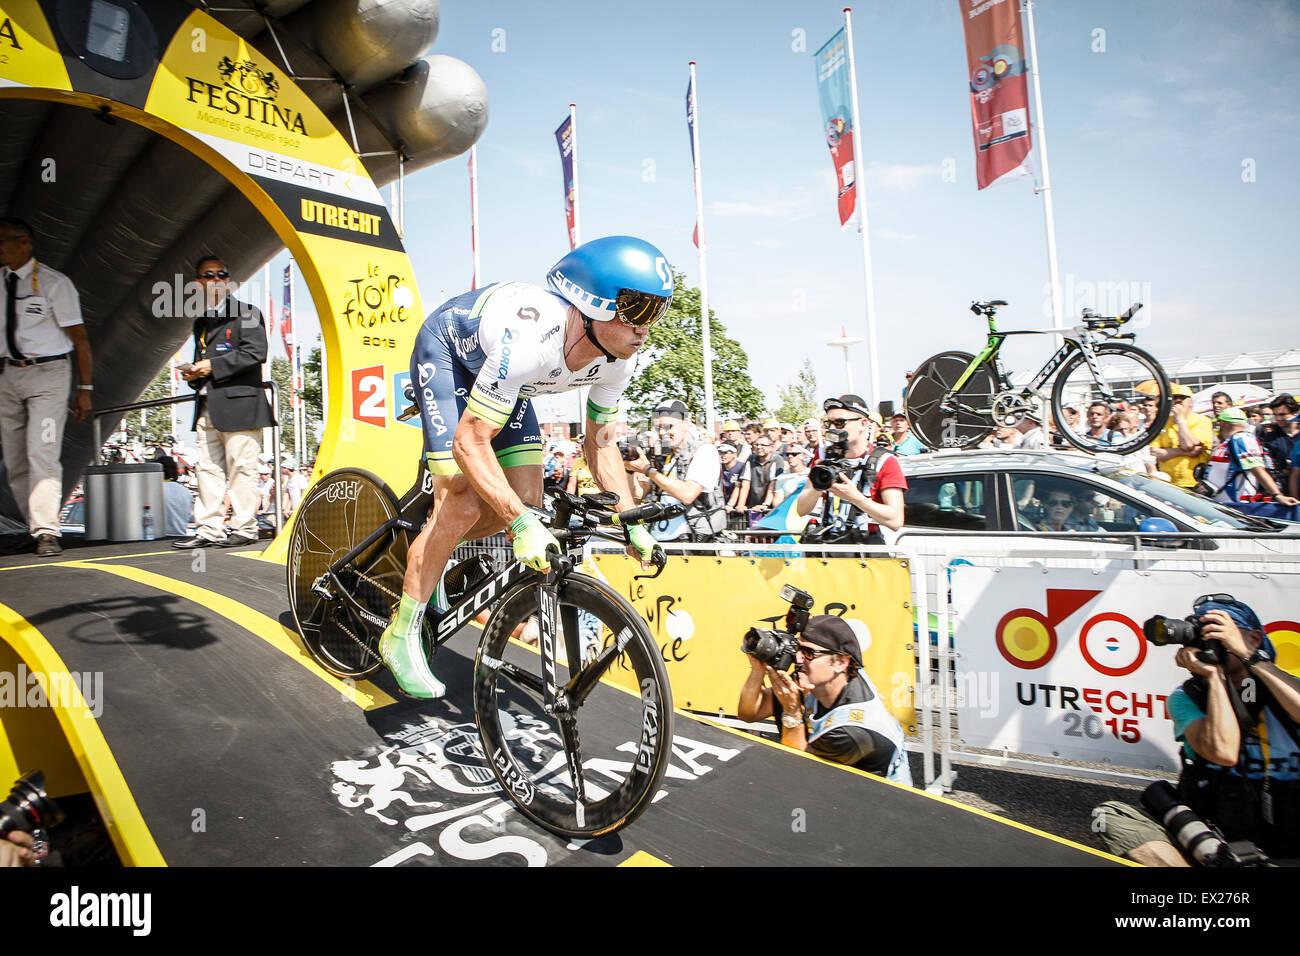 Utrecht, Países Bajos. El 4 de julio de 2015. Tour de Francia etapa contrarreloj, Simon GERRANS, equipo Orica Imagen De Stock